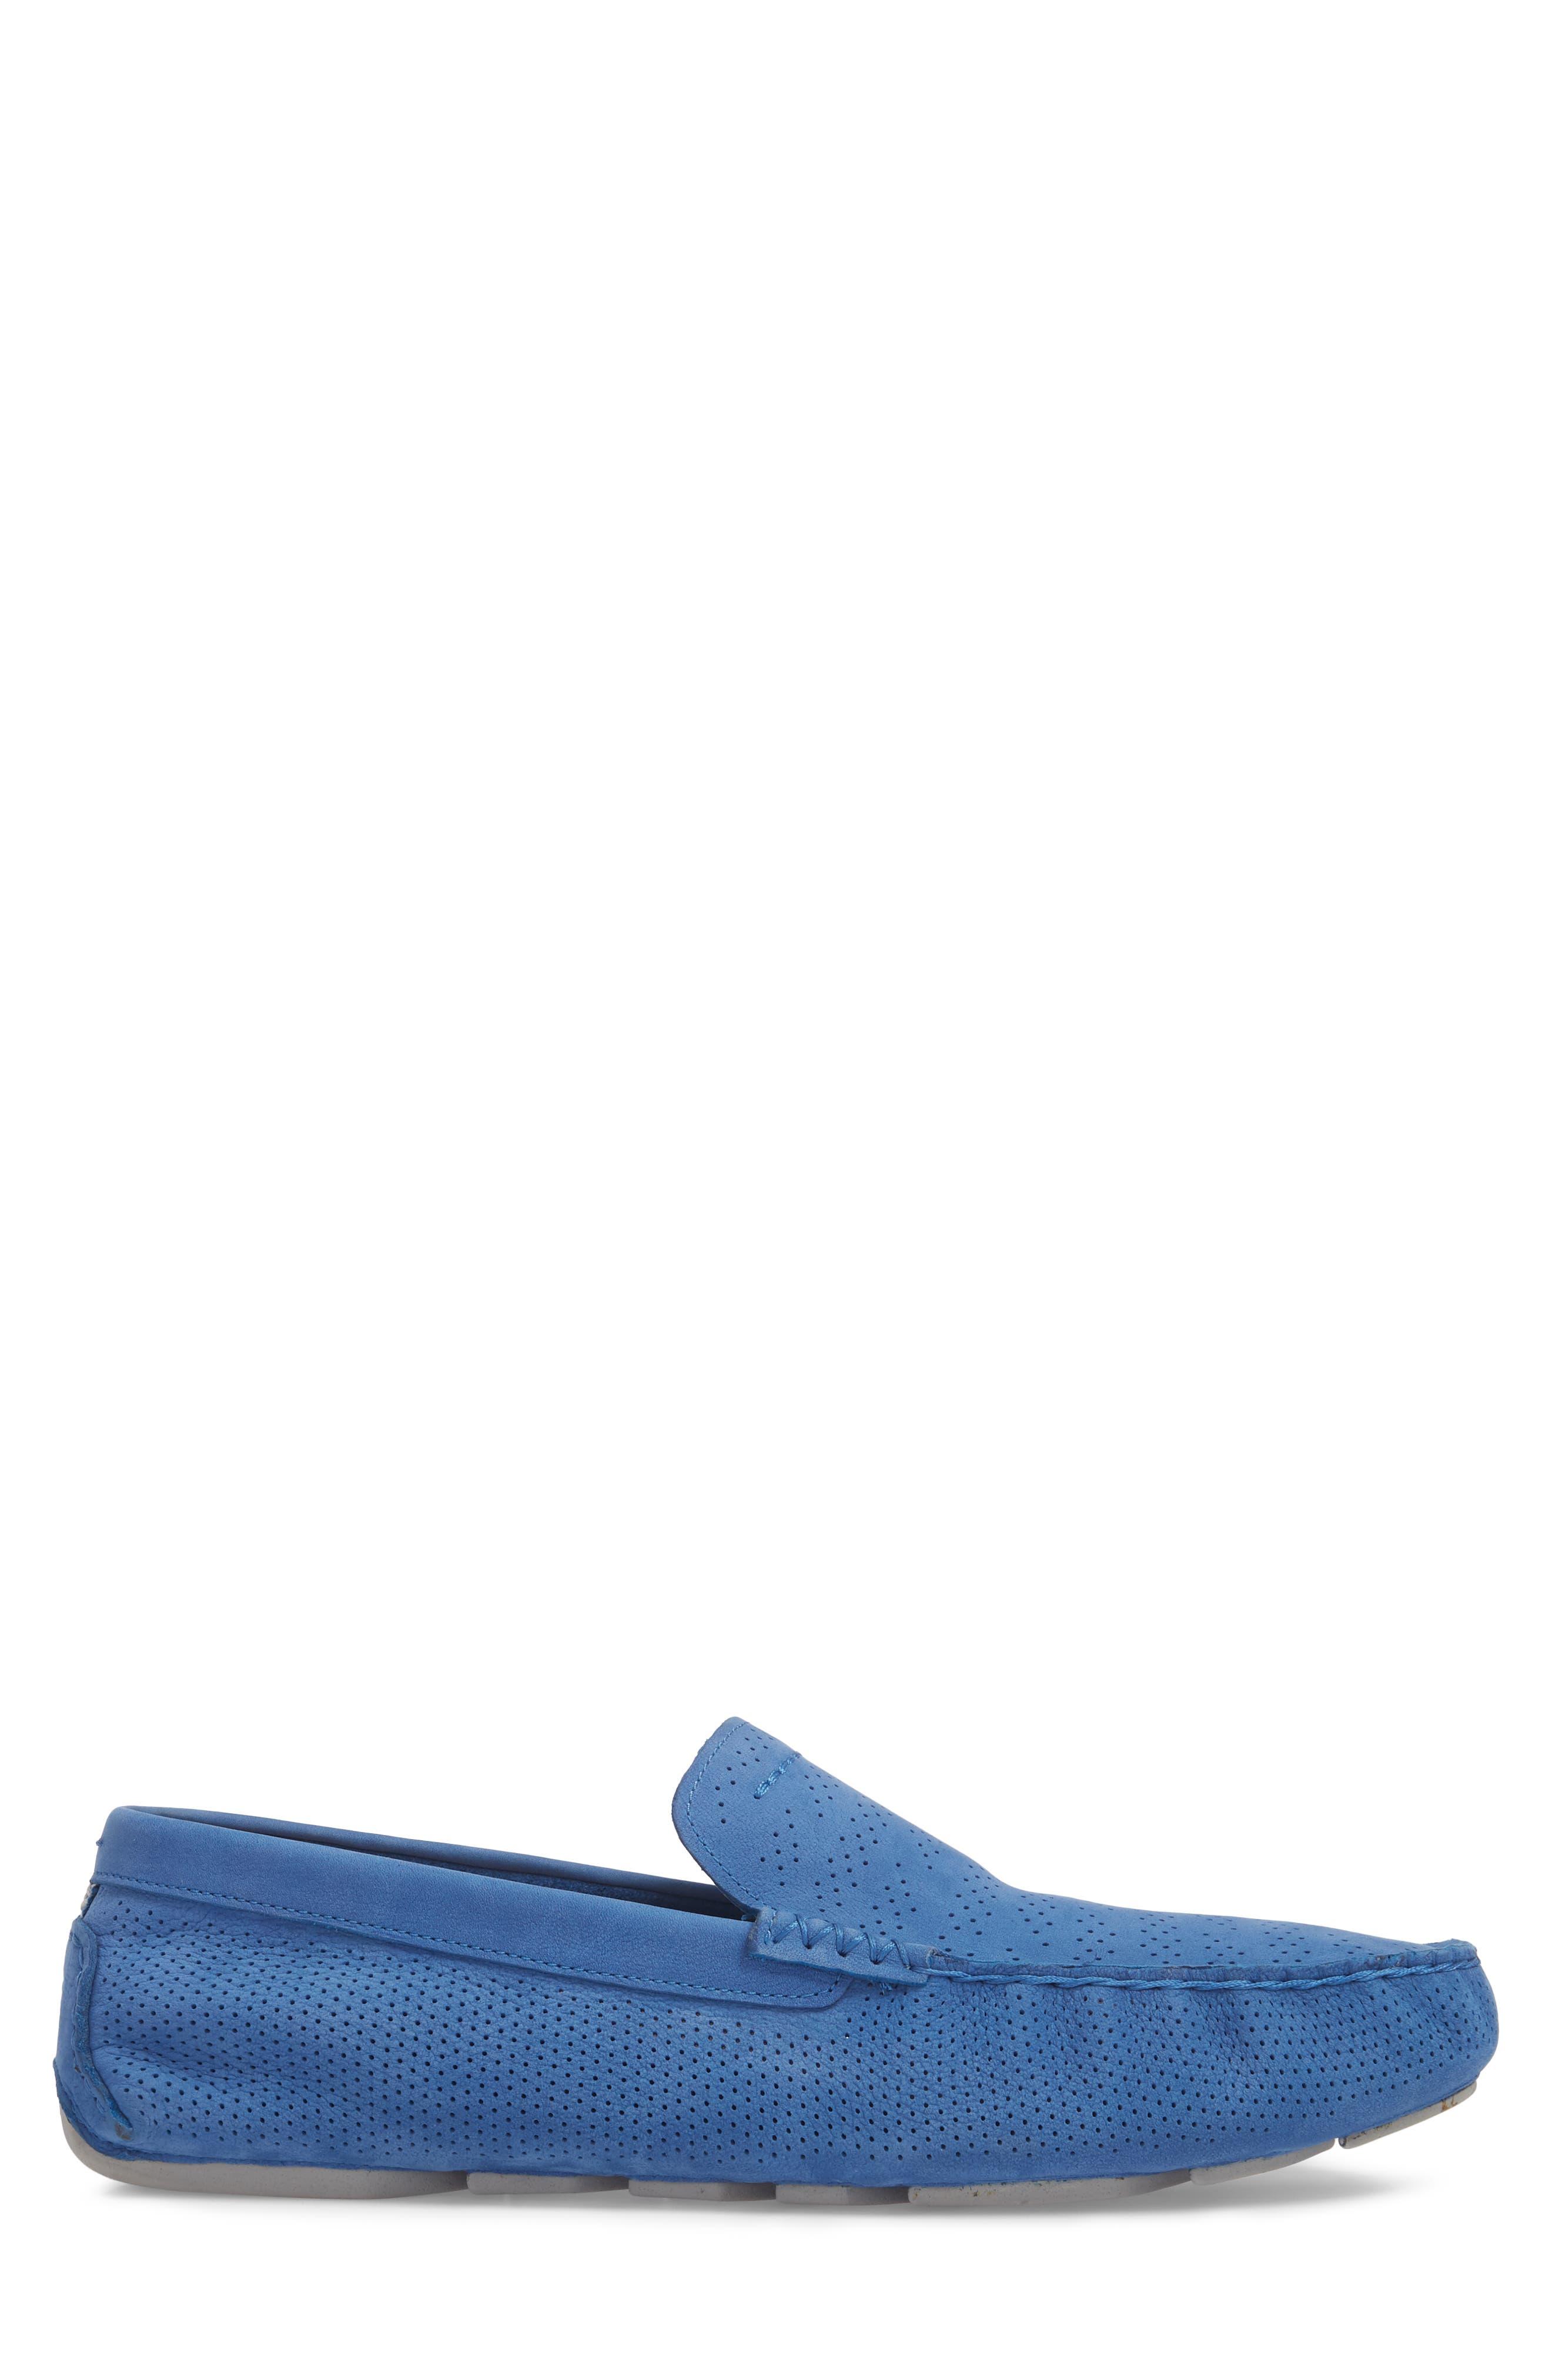 Alternate Image 3  - UGG® Henrick Twinsole® Driving Shoe (Men)